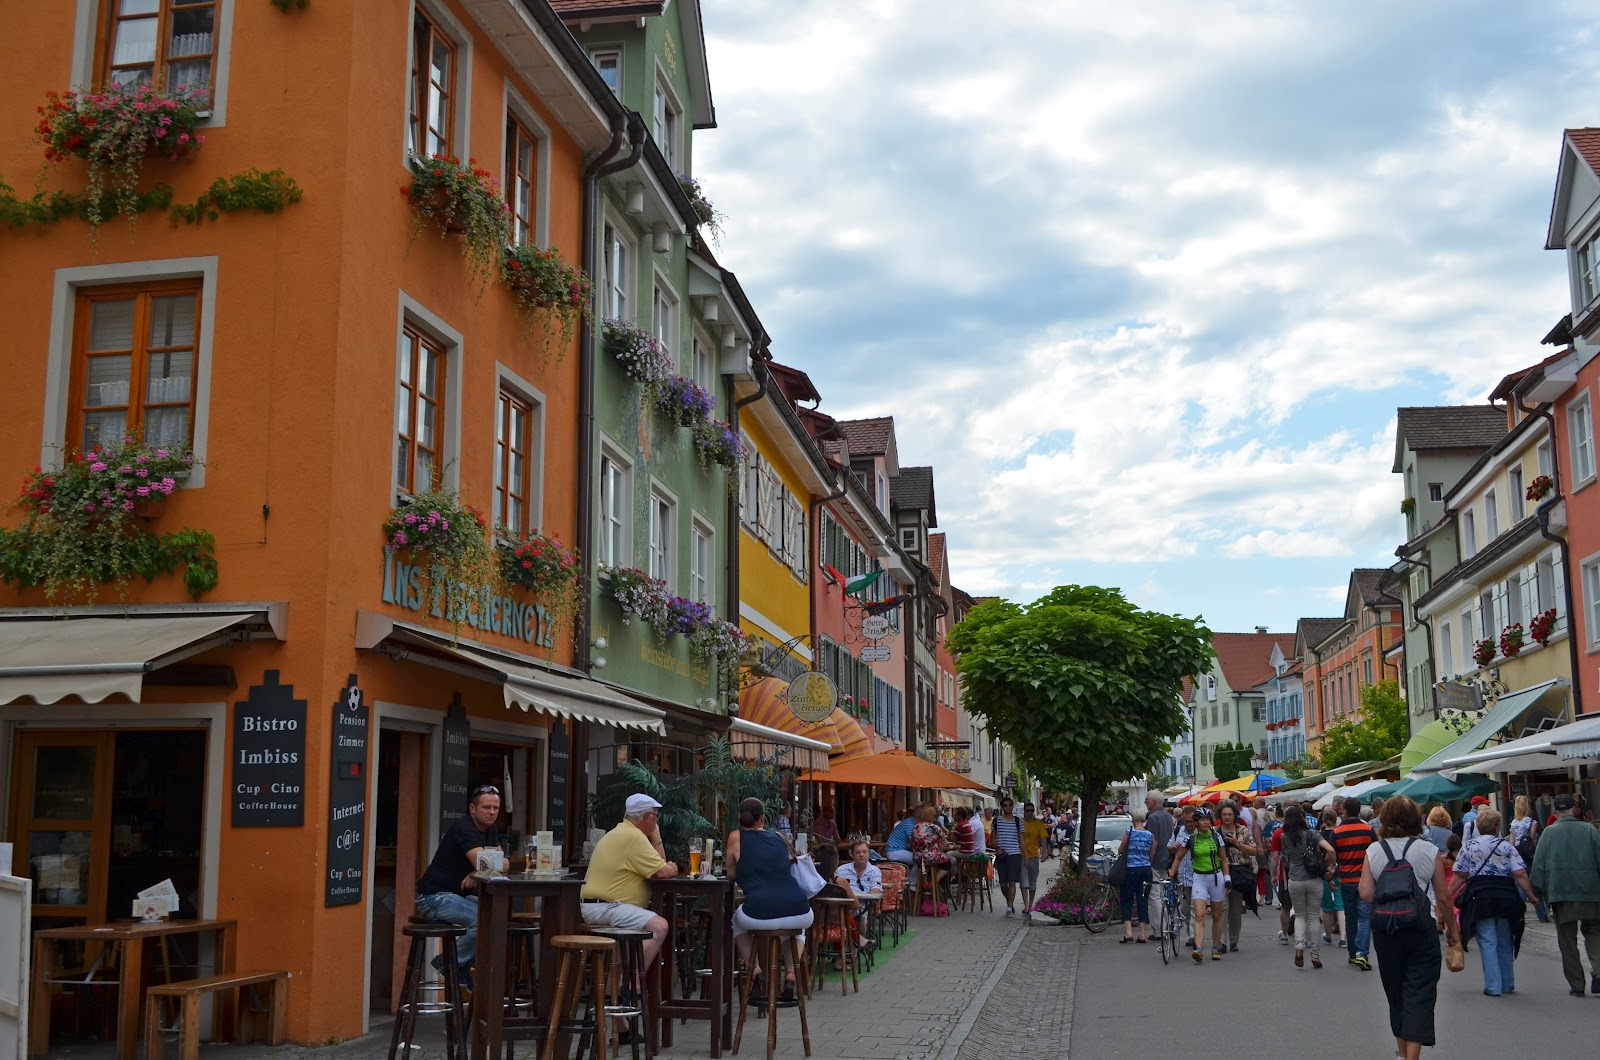 Bodensee-Hotel Sonnenhof (Hotel) Kressbronn am Bodensee (Germany) Deals